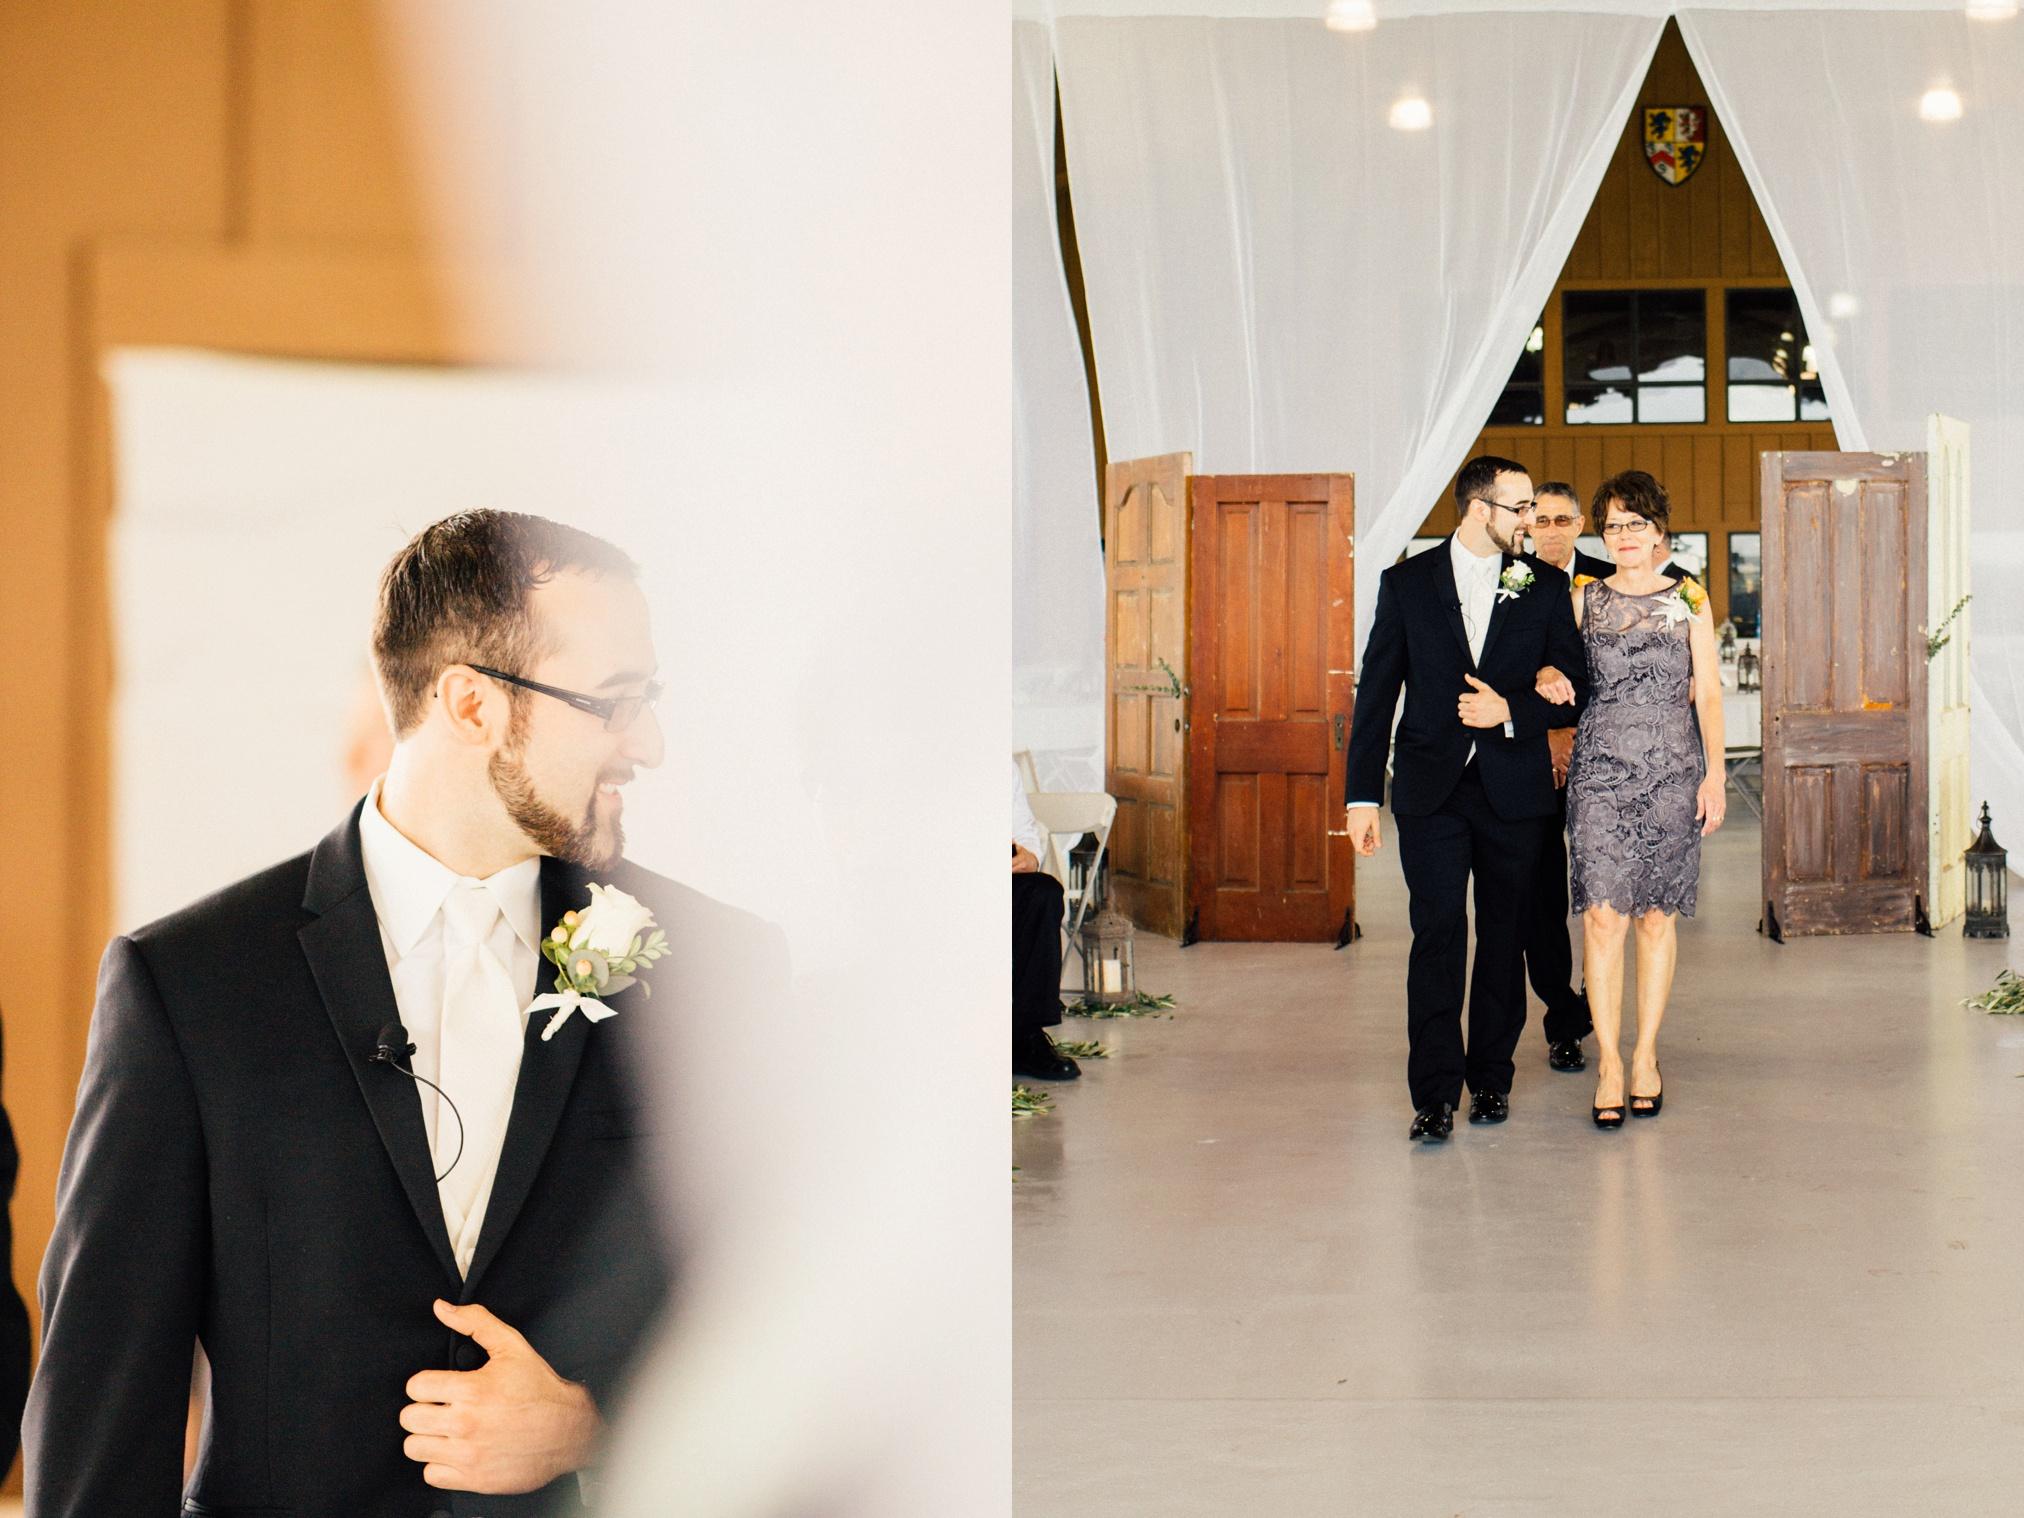 schmid_wedding-293.jpg